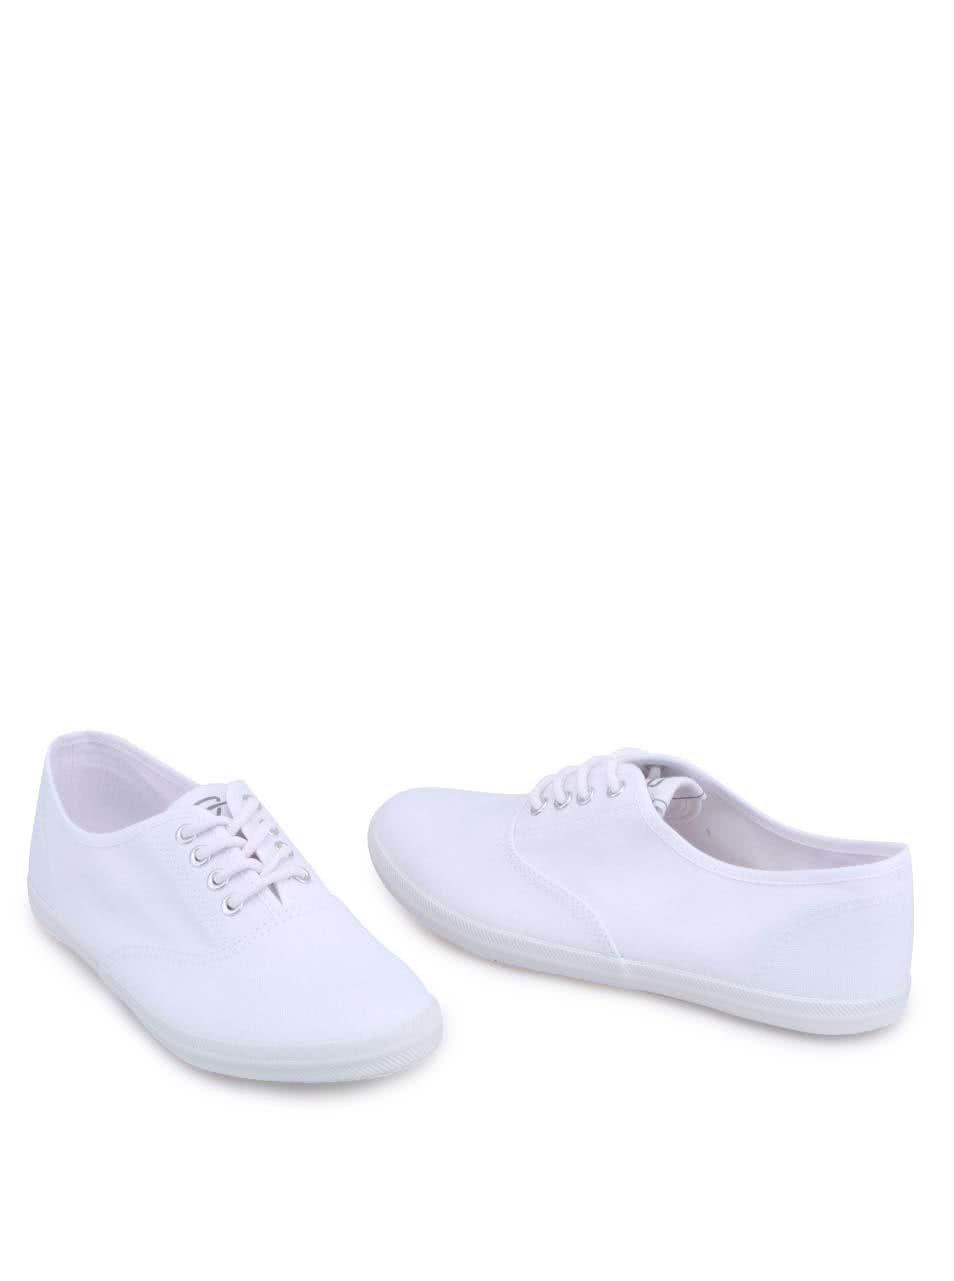 Bílé plátěné tenisky Tamaris ... 1fe06d7c53